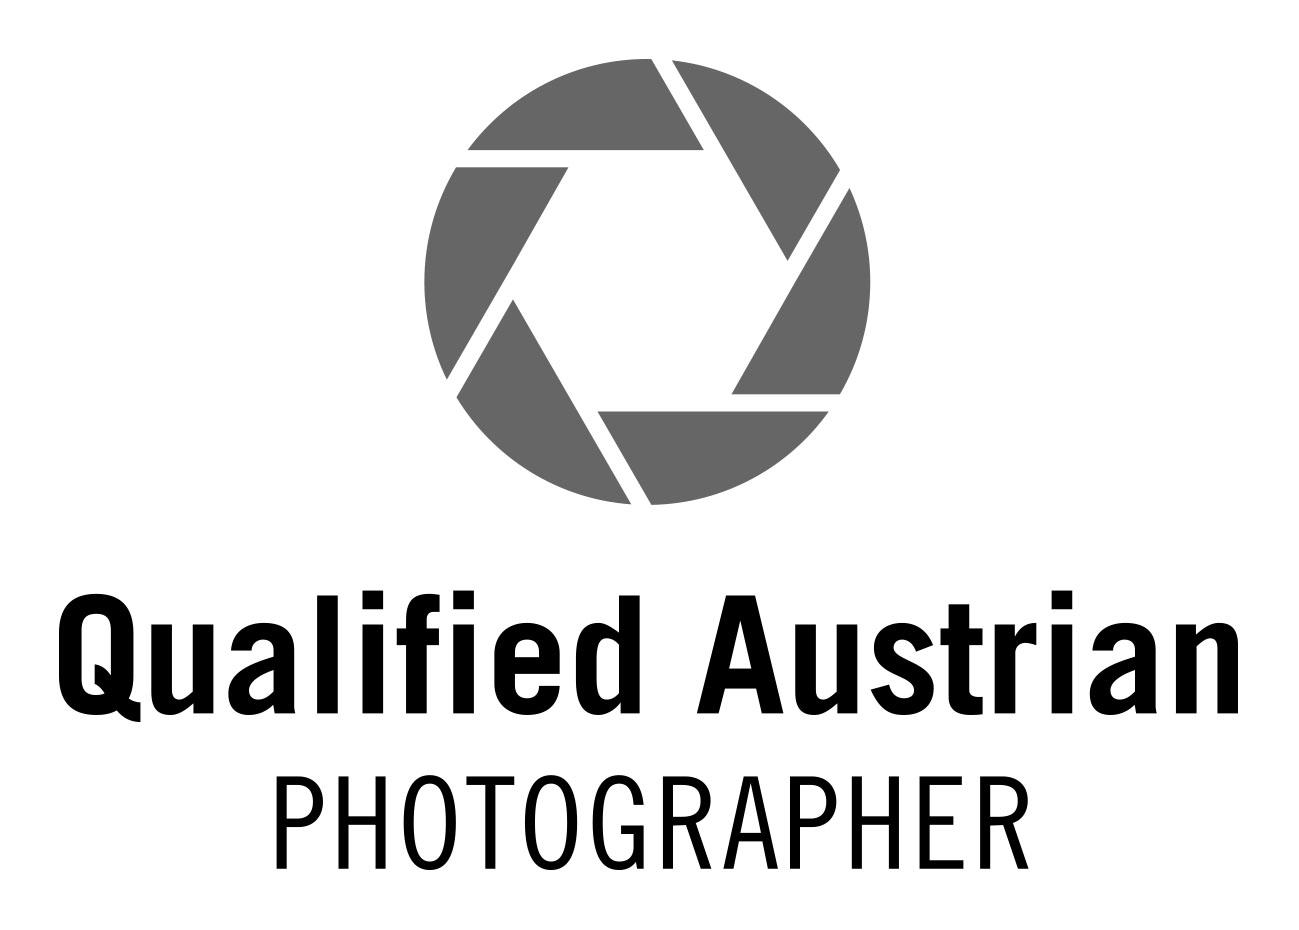 Qualified Austrian Photographer.jpg